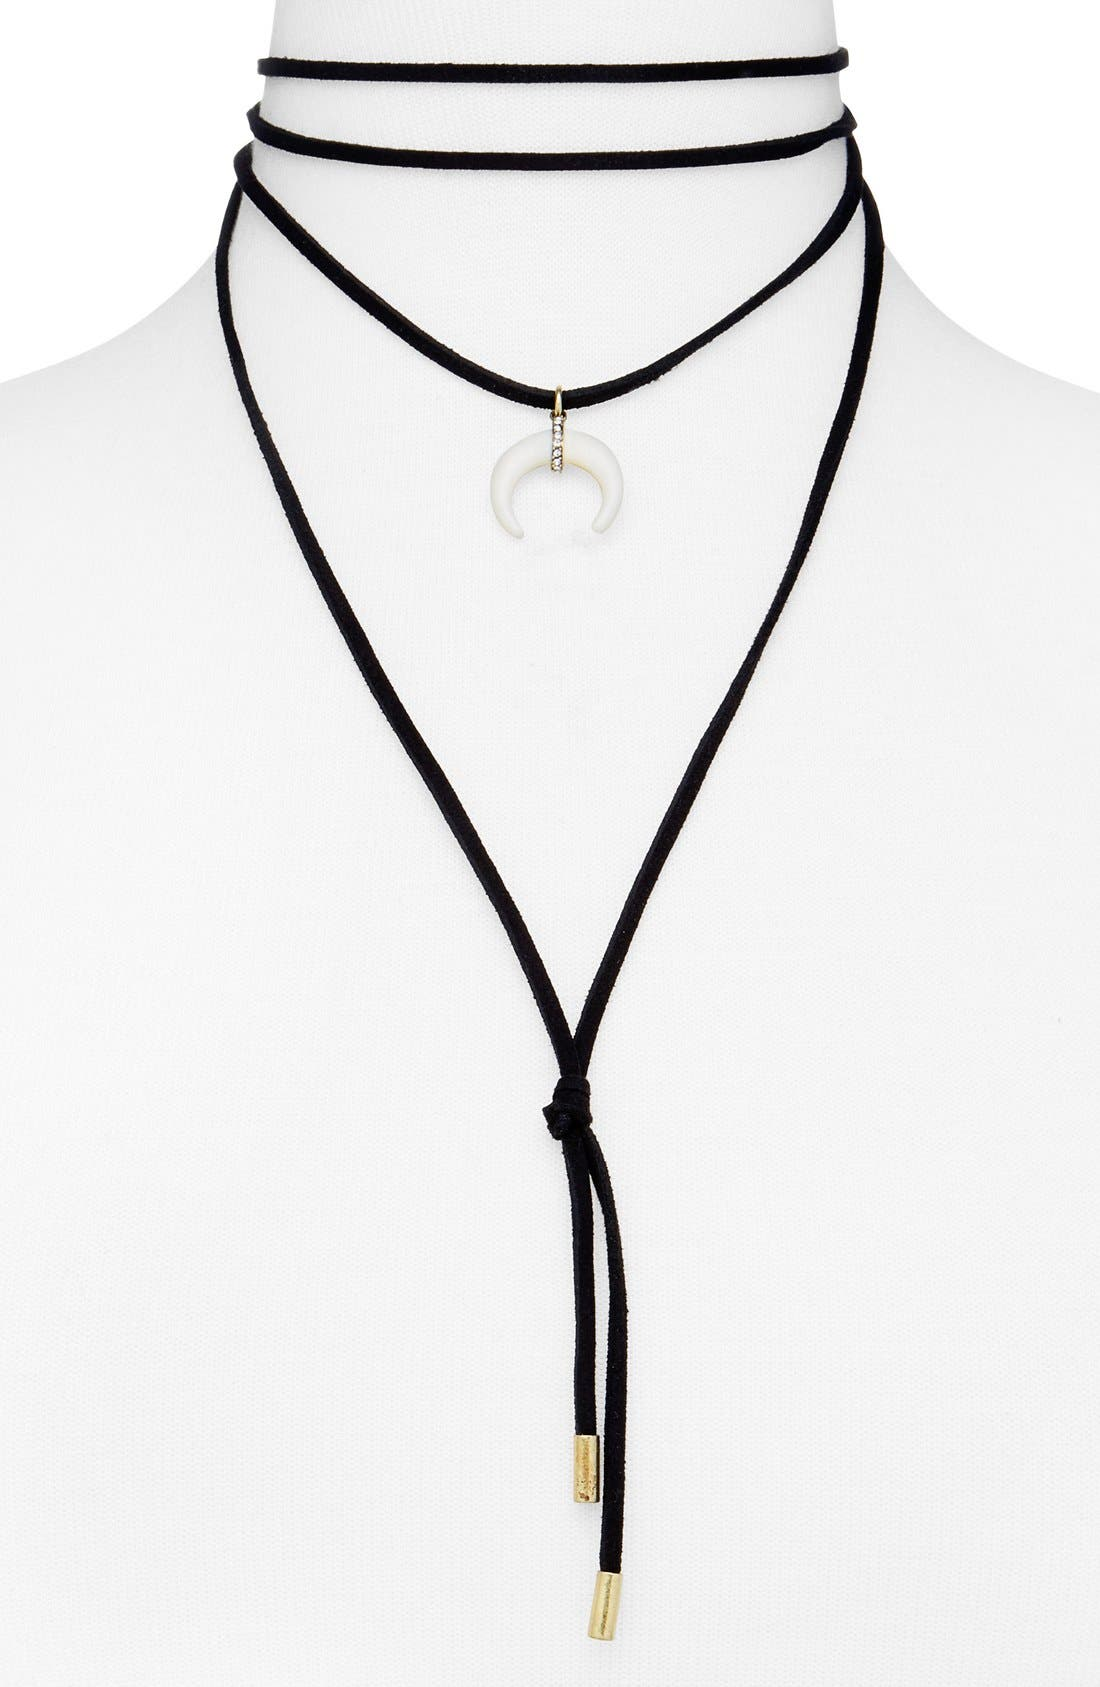 Main Image - BaubleBar Moana Lariat Choker Necklace